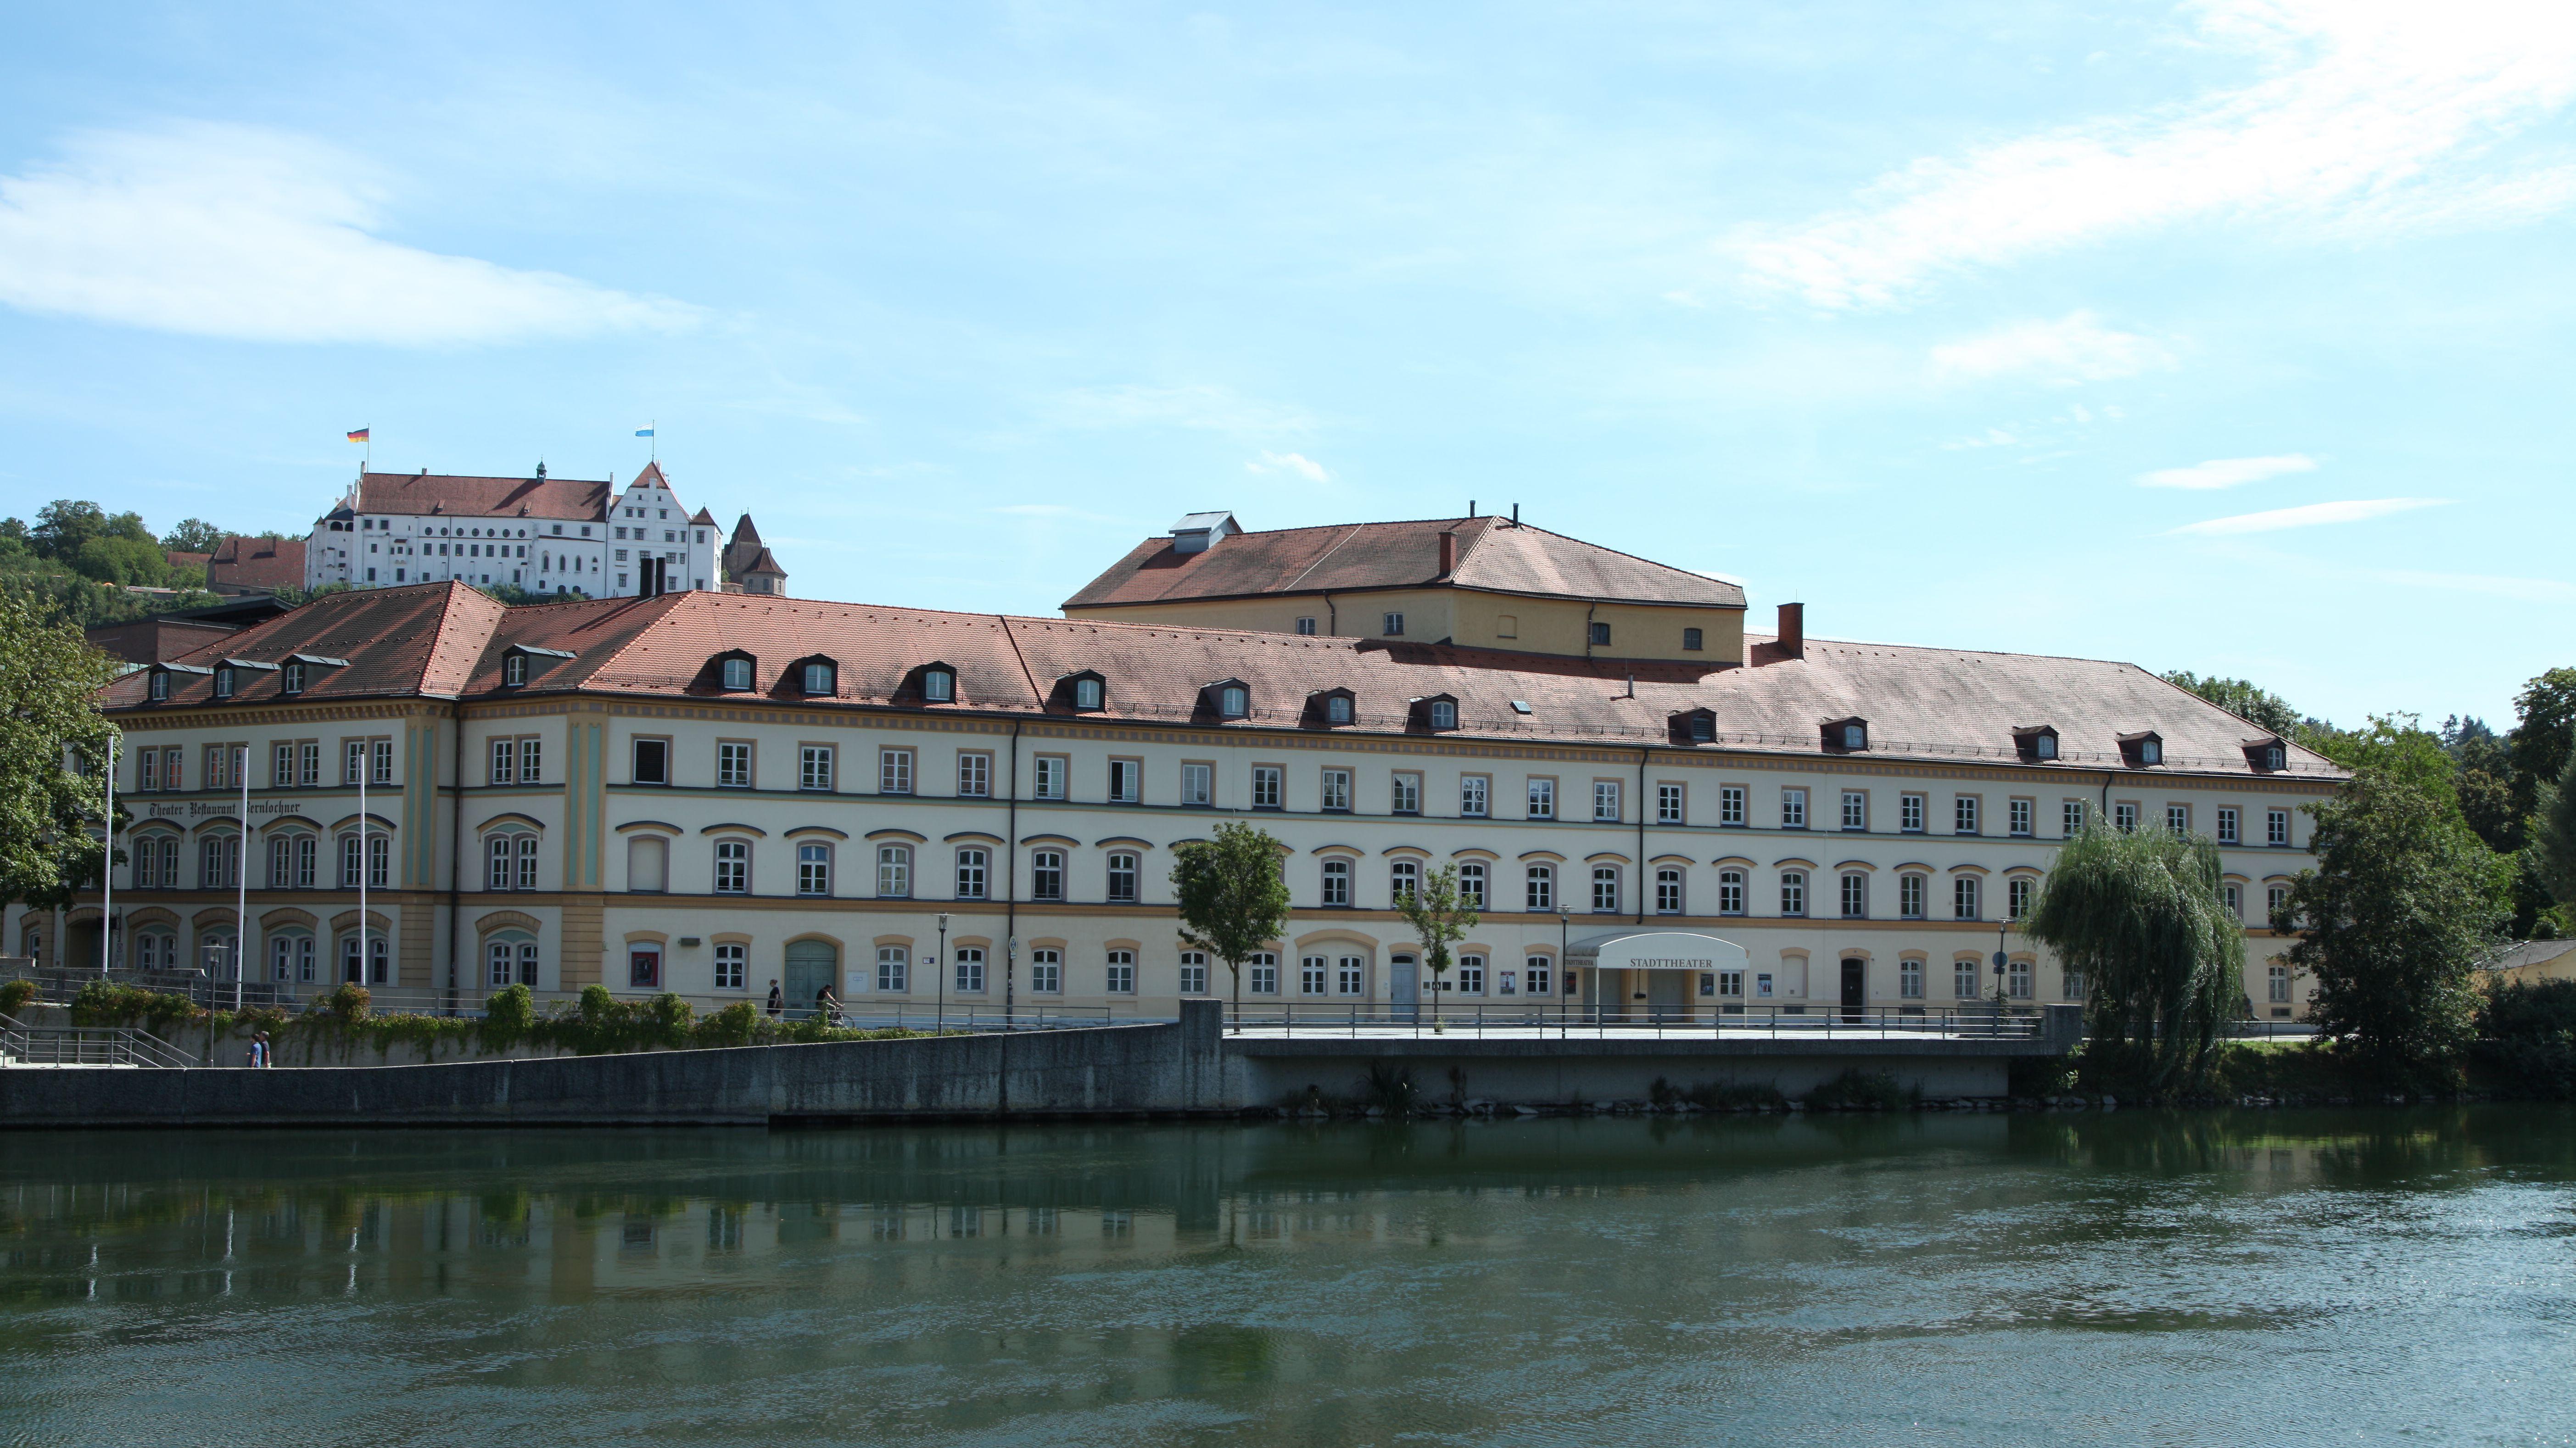 Landshuter Stadttheater